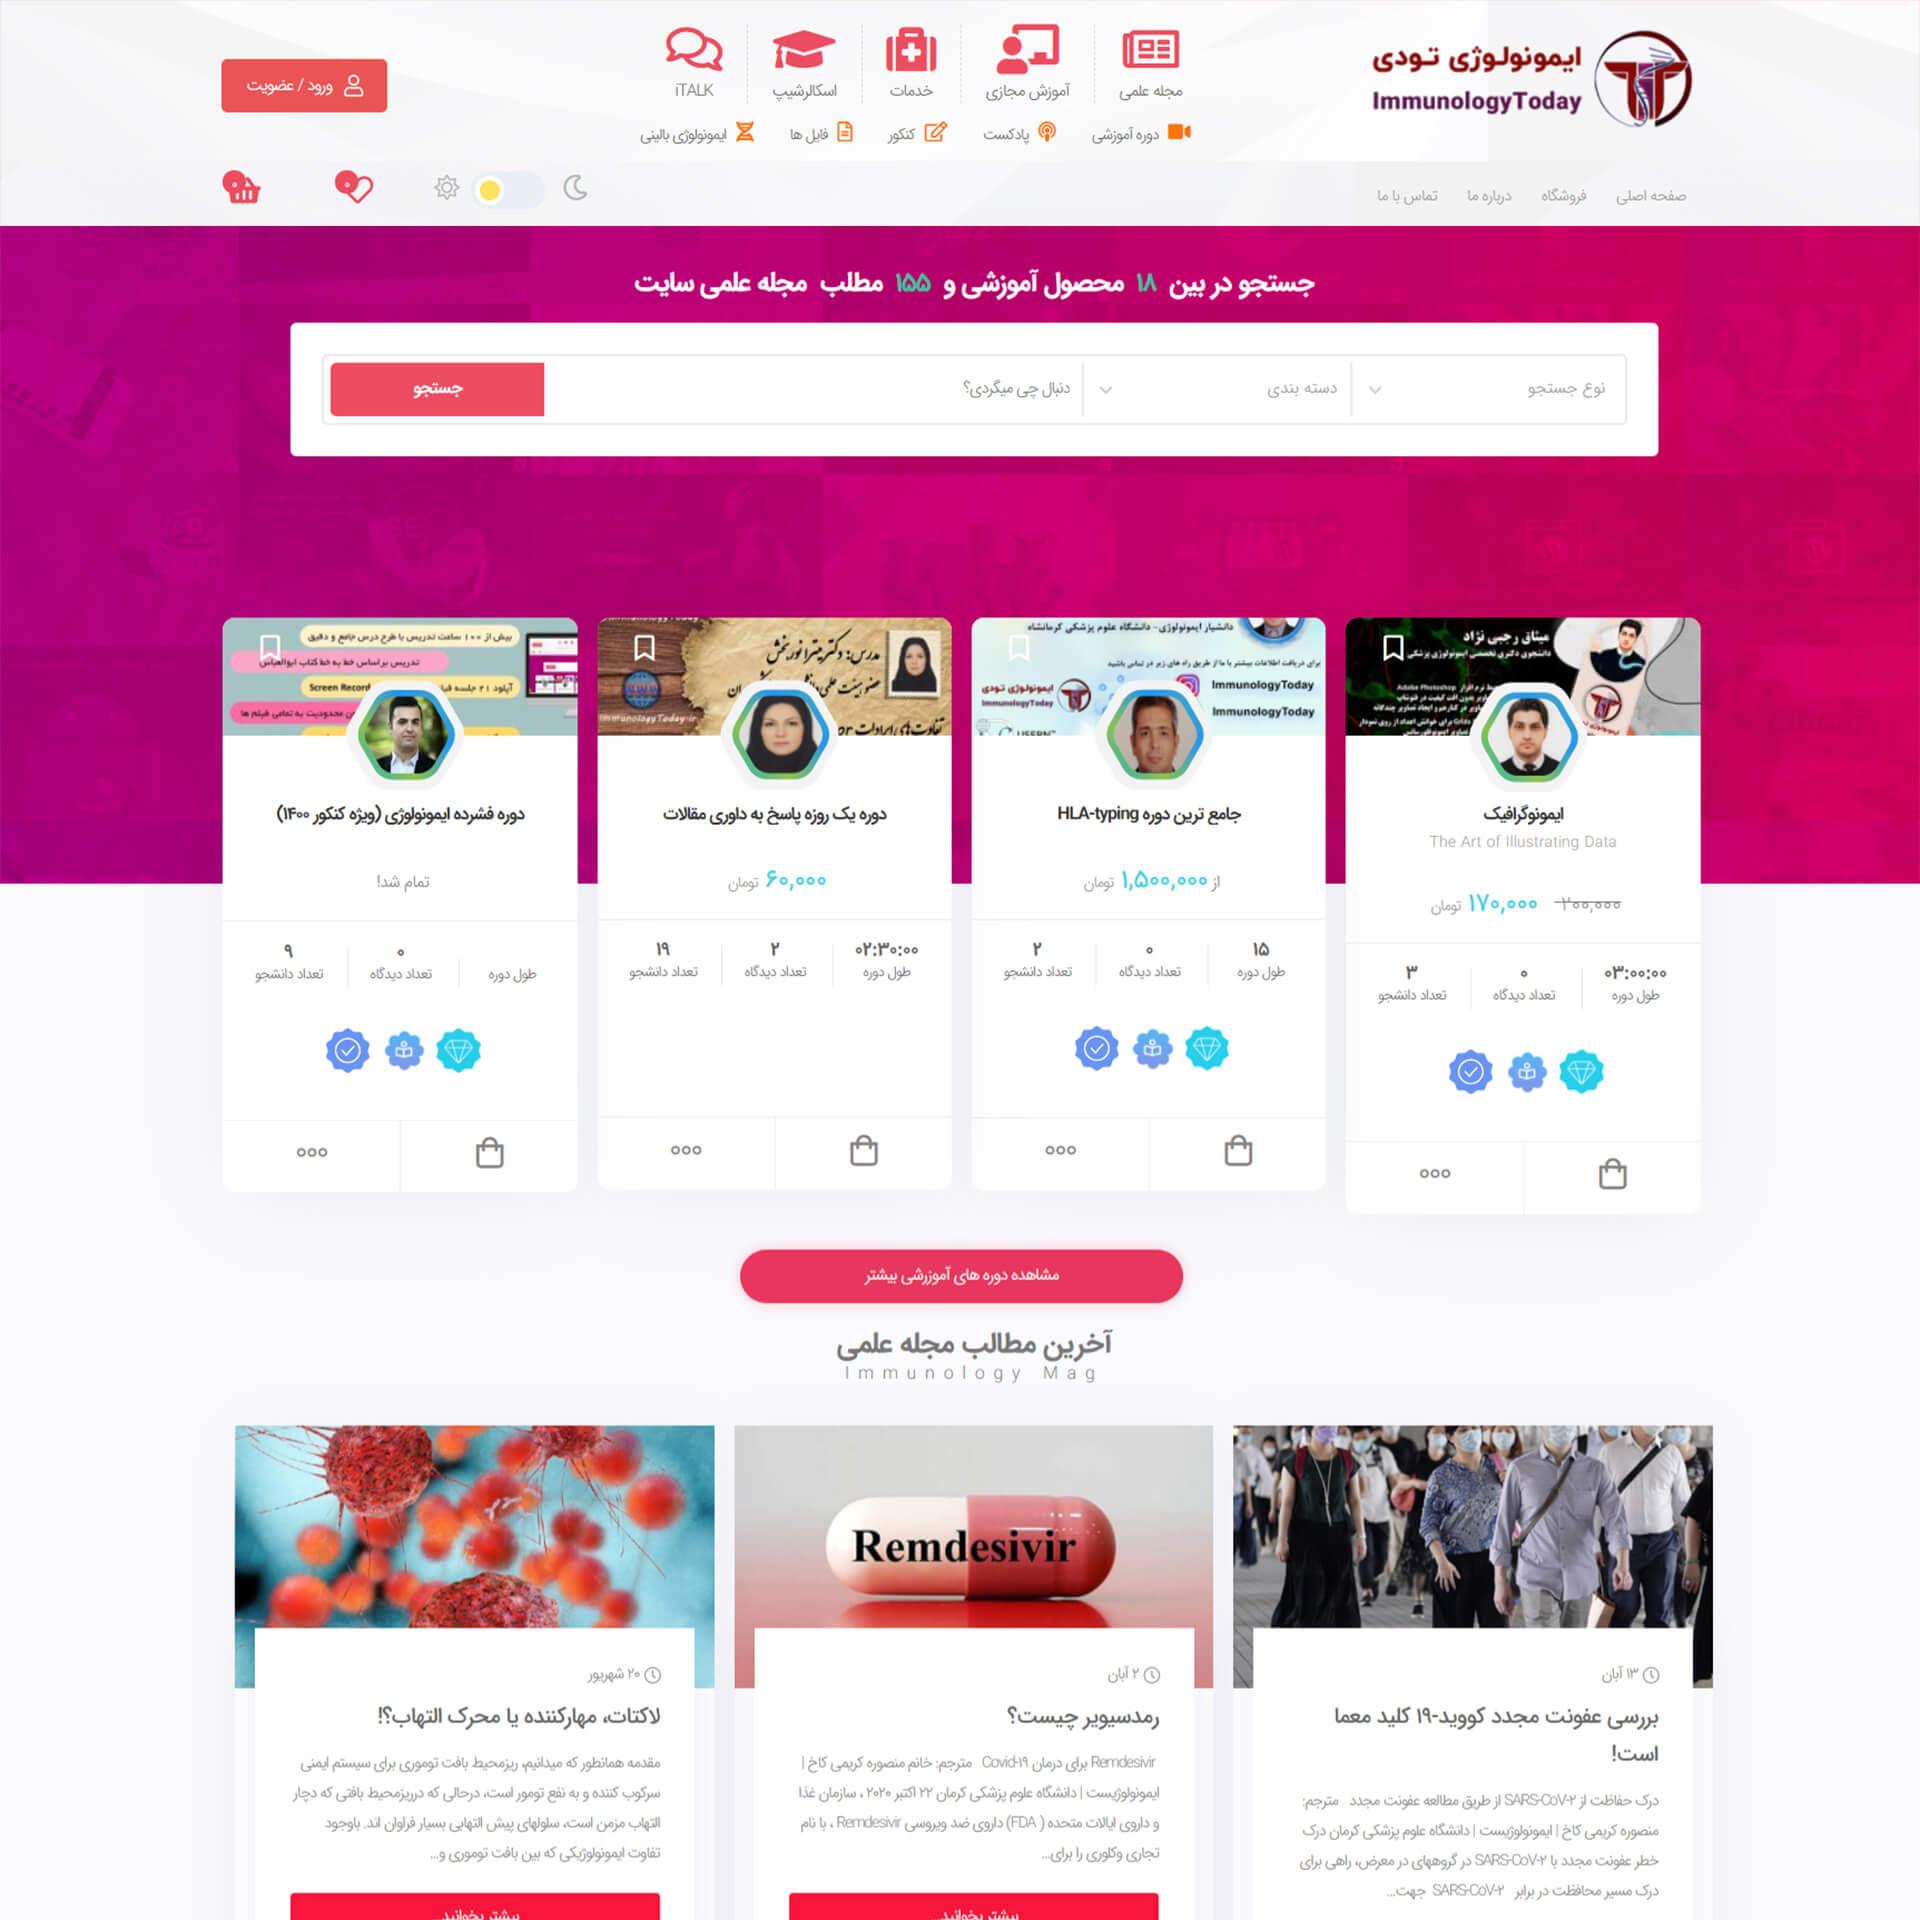 طراحی وبسایت ایمونولوژی تودی